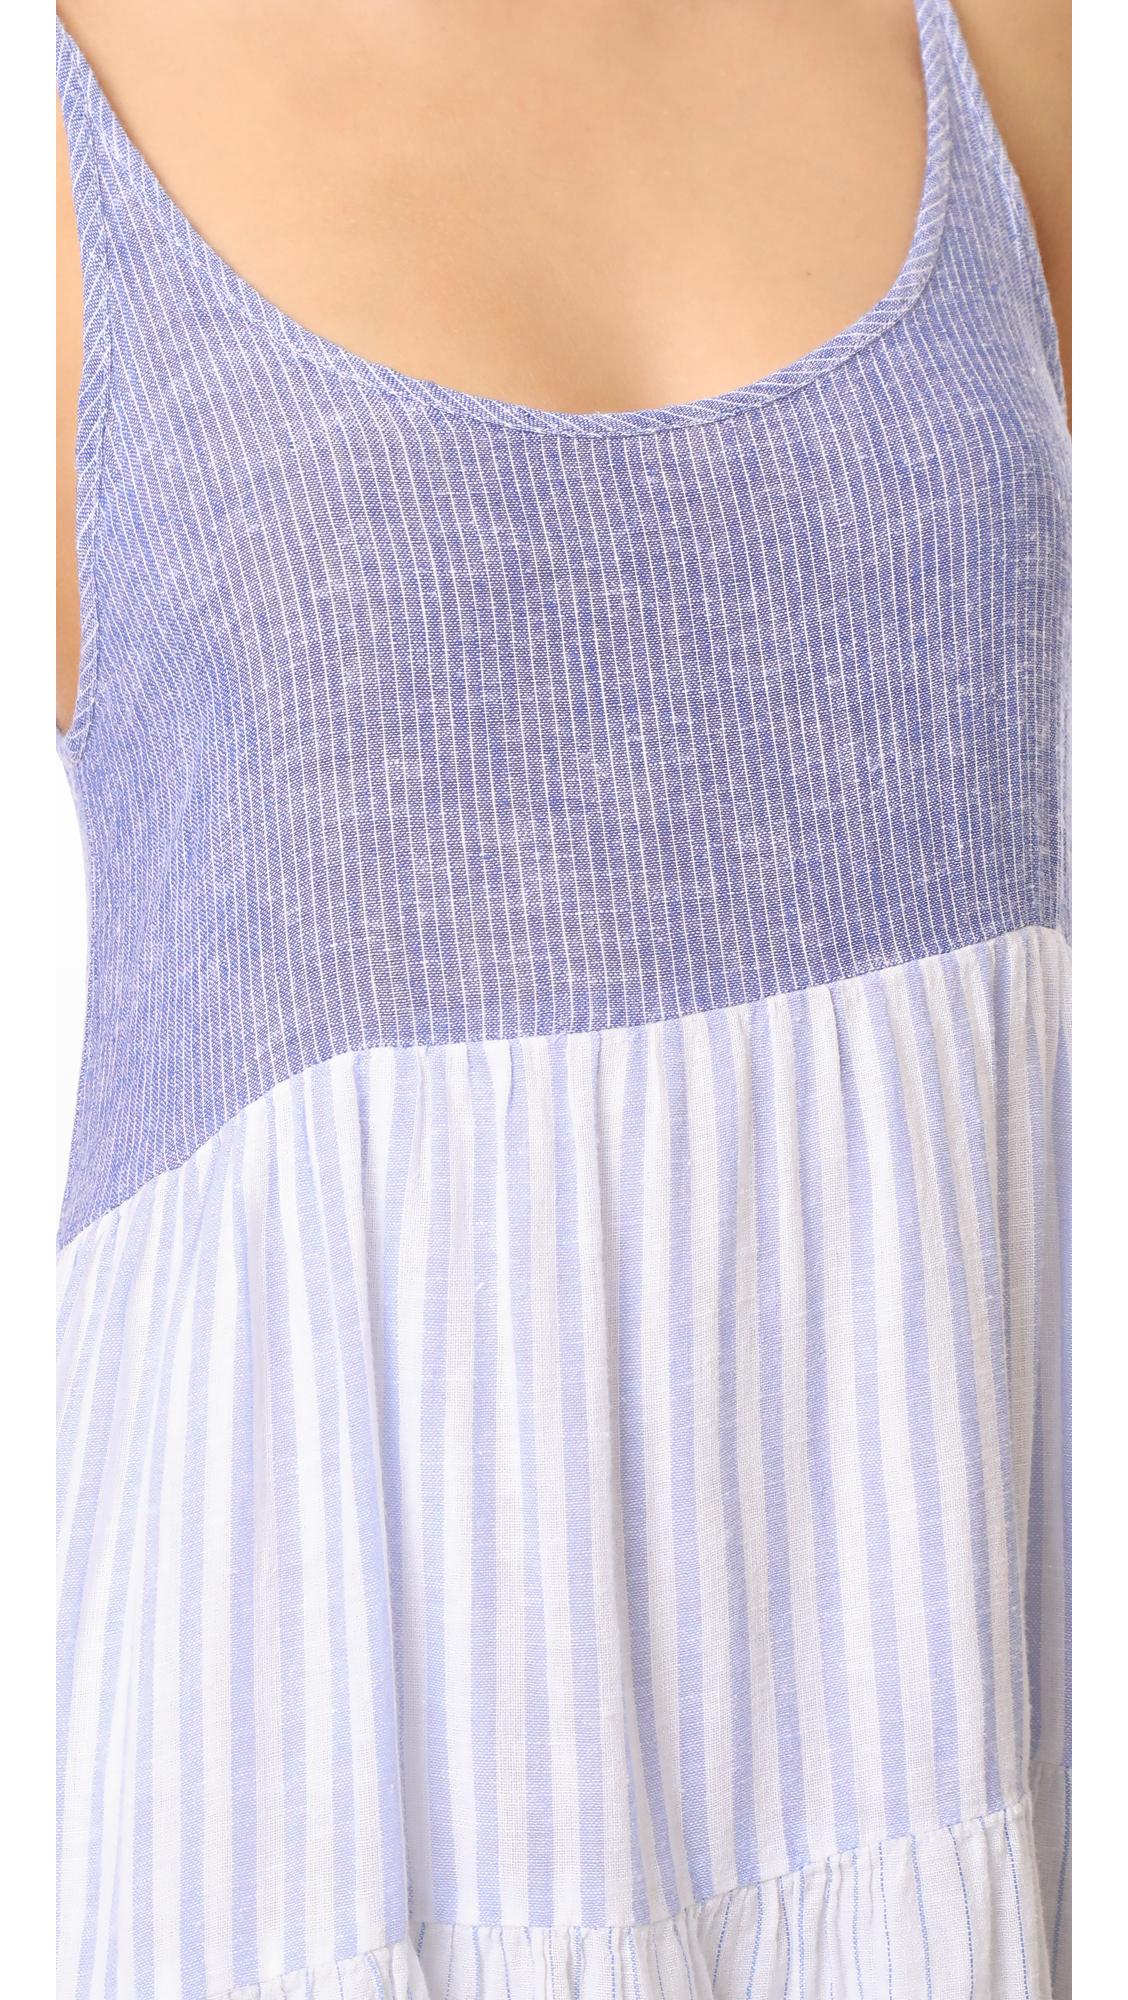 Cheap dress rails partials